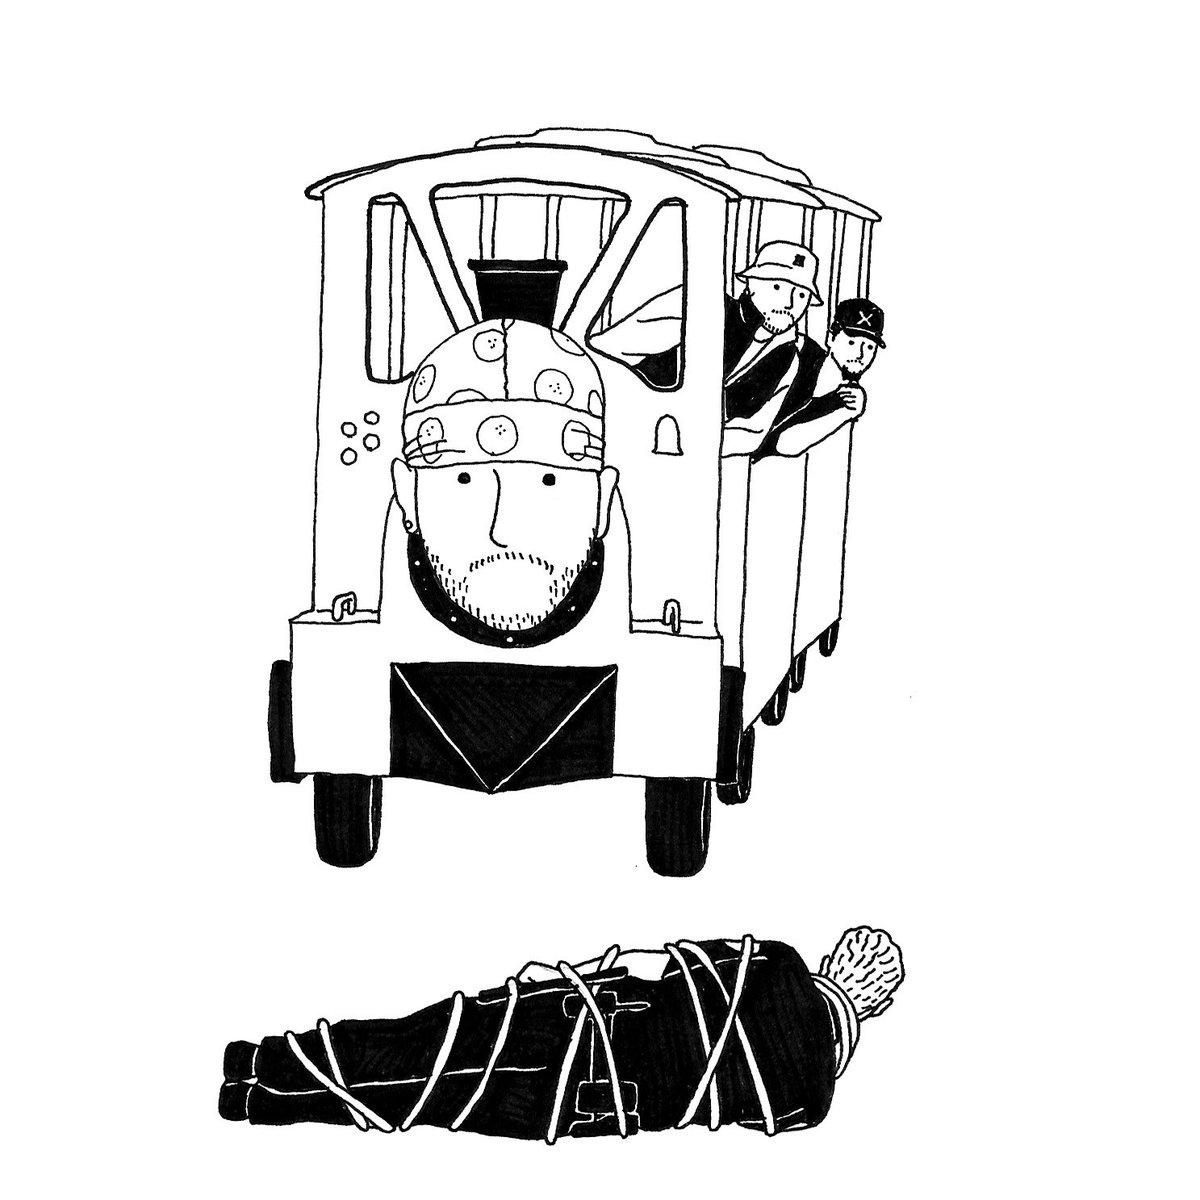 Lil Scammer That Could #guapdad4000 #denzelcurry  #hiphop #trap #rap #rapper #singer #songwriter  #oakland #california #carolcity #florida #america #us #drawing #illustration https://t.co/c7IzvLZa4X